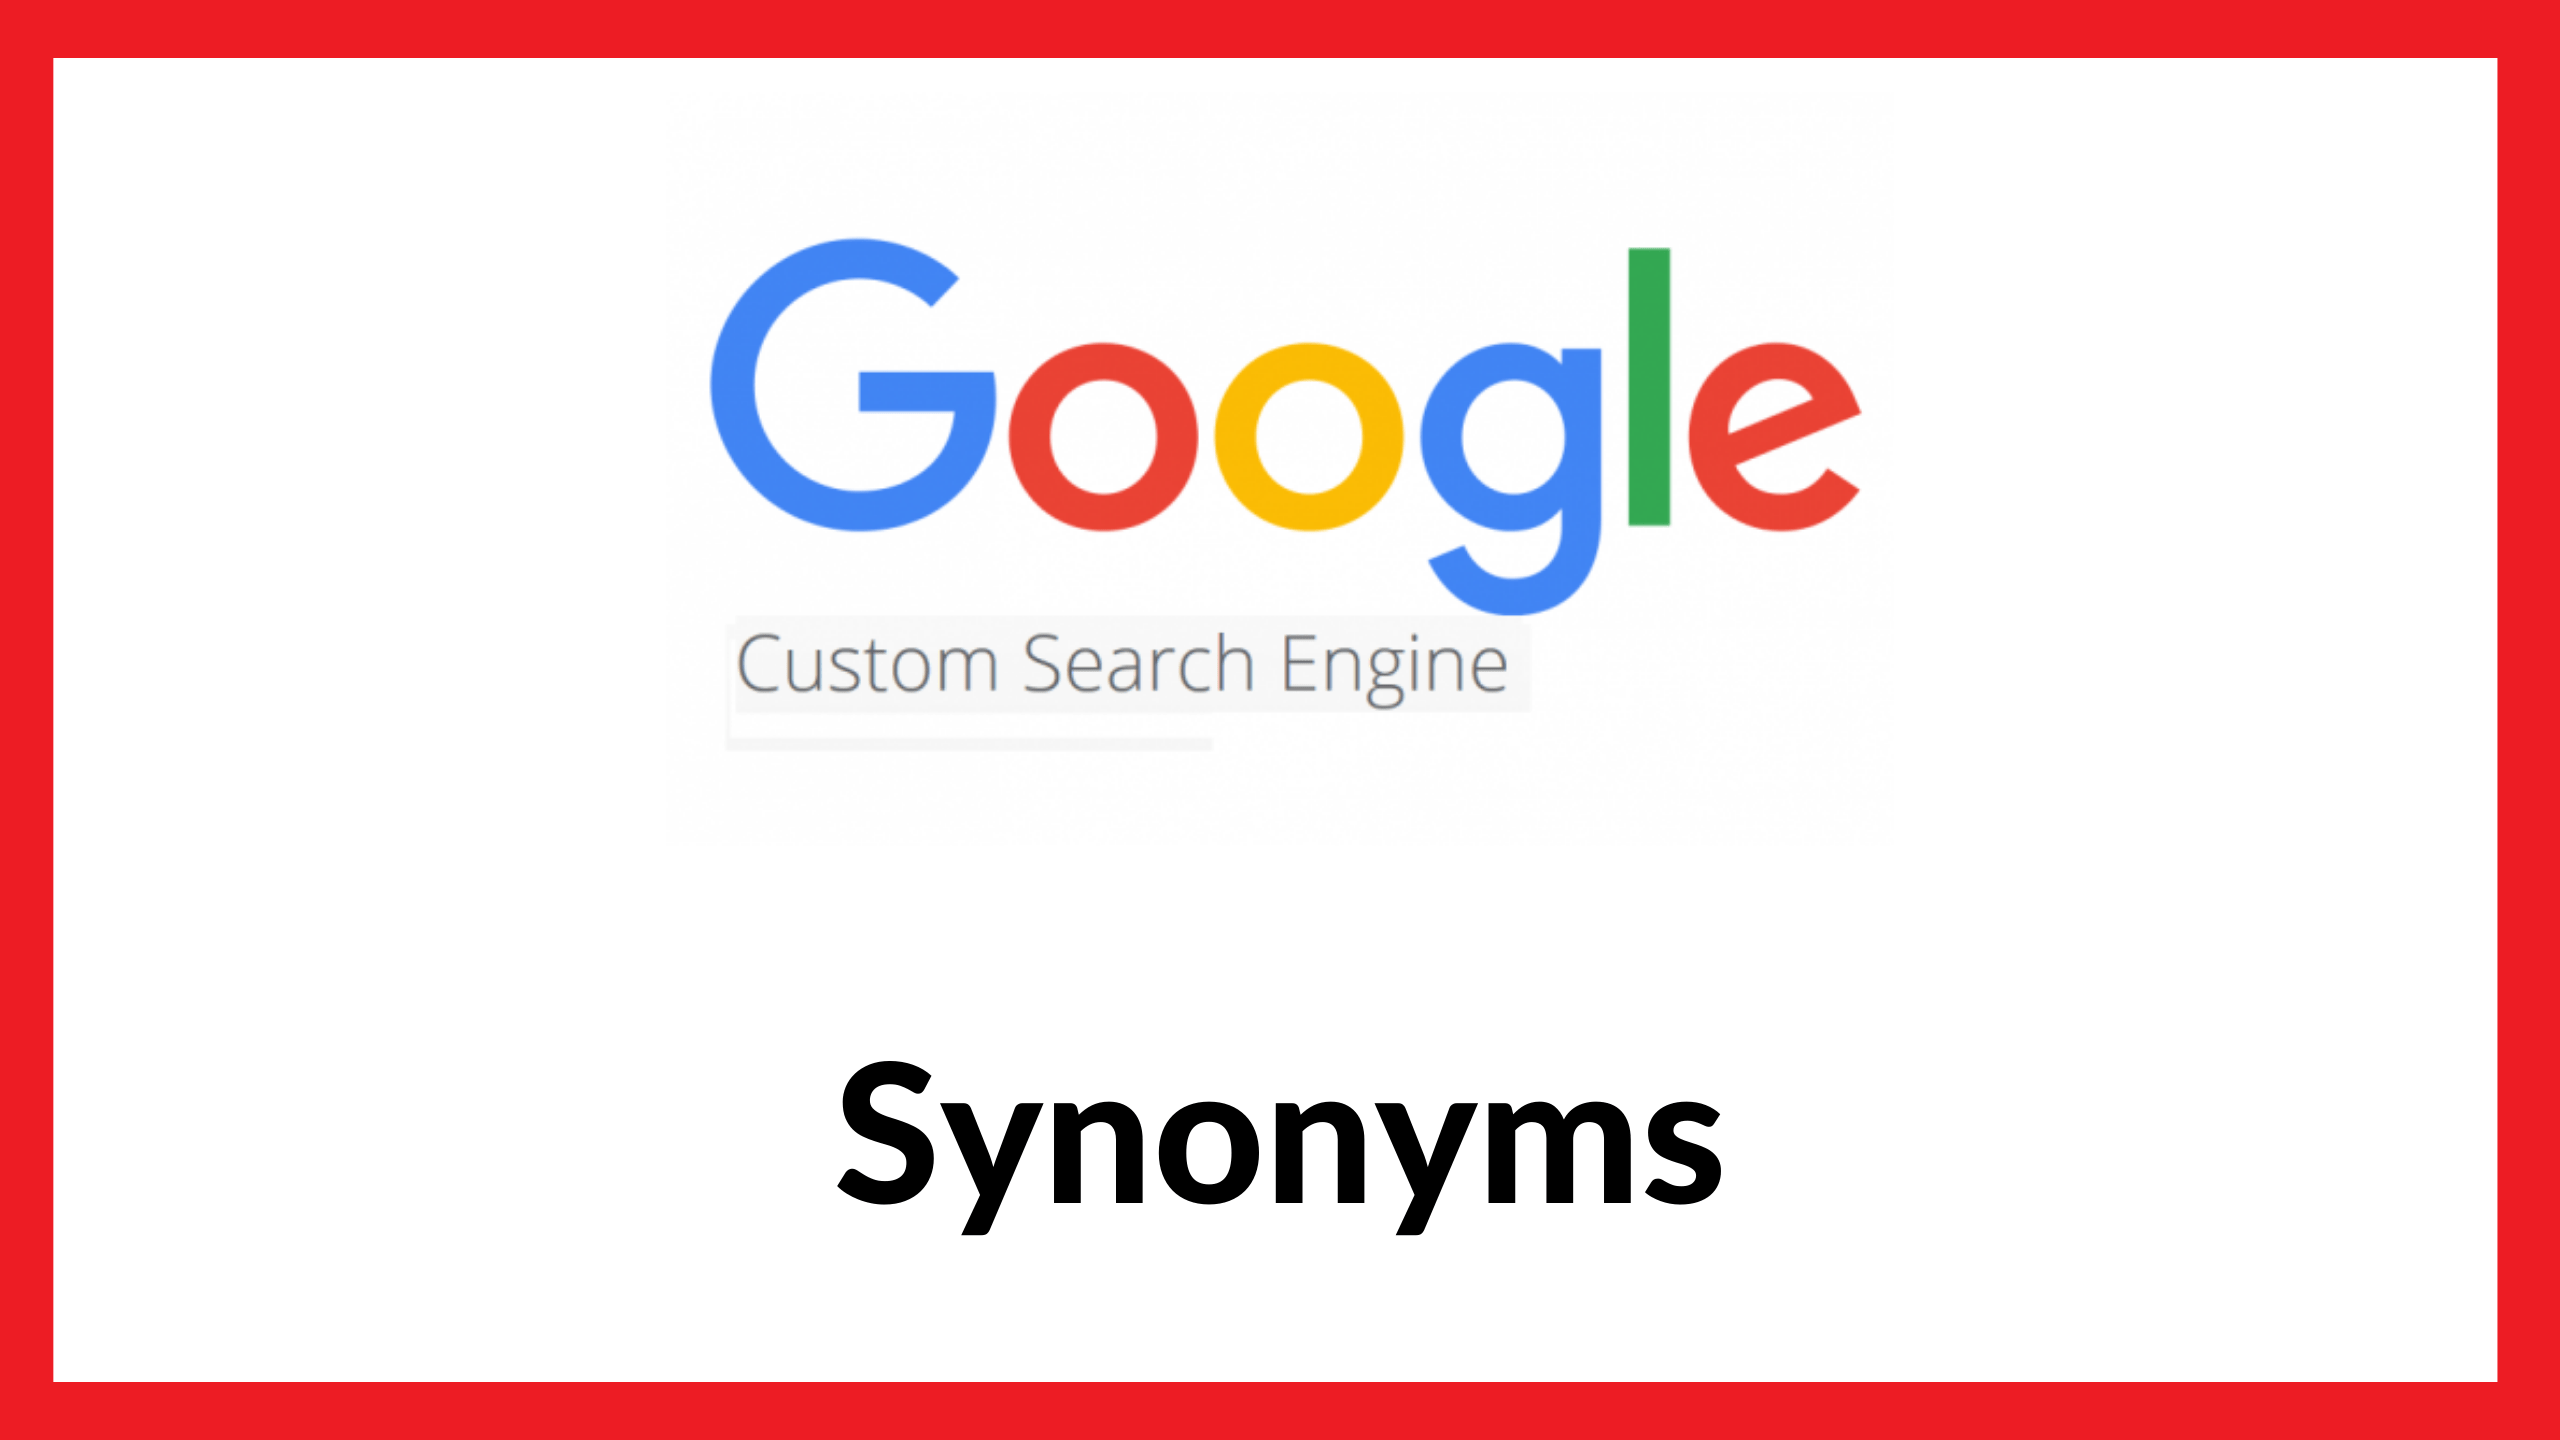 Google Custom Search Synonyms